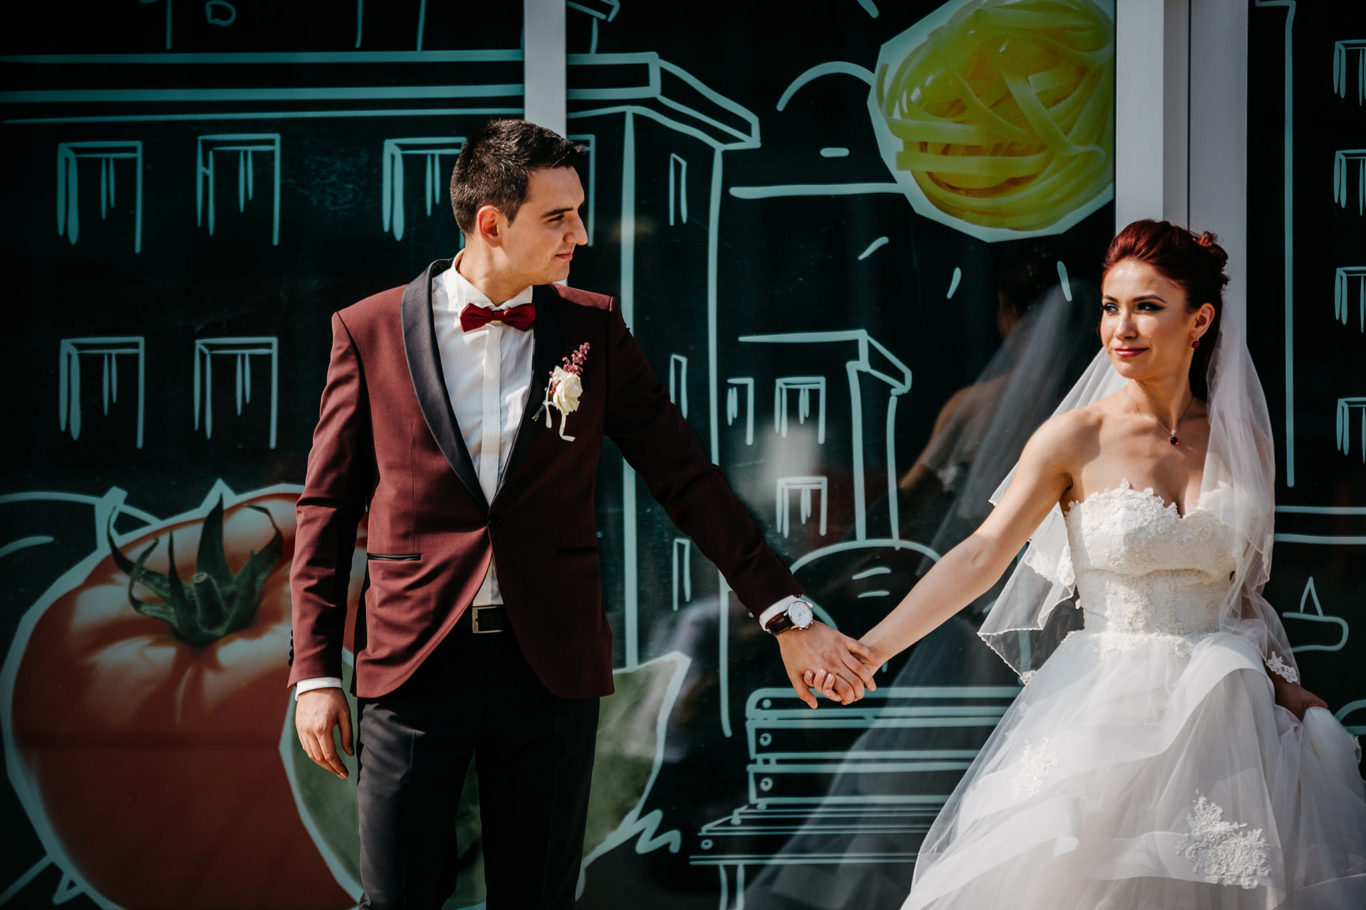 0332-fotografie-nunta-bucuresti-cristina-nicusor-fotograf-ciprian-dumitrescu-dc1_0249